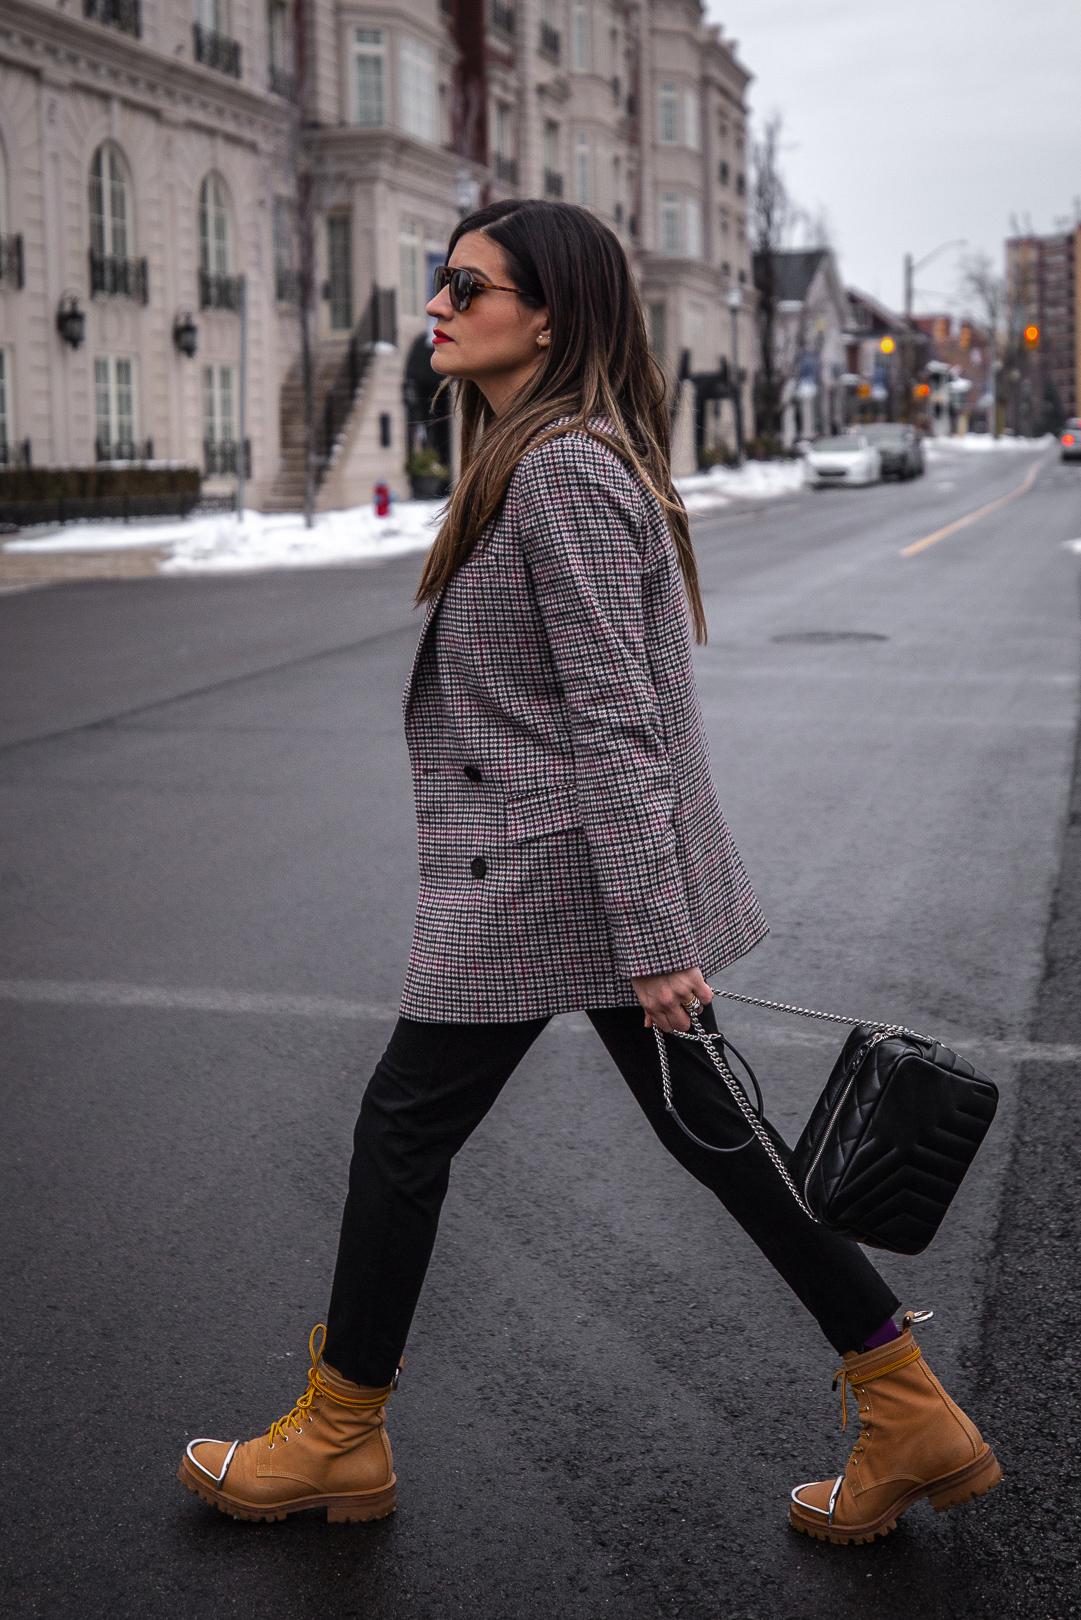 nathalie martin - anine bing lightning bold sweater, alexander wang lyndon boots, bonlook jerry glasses, plaid blazer, frank and eileen joggers, street style, pinterest @woahstyle_7154.jpg